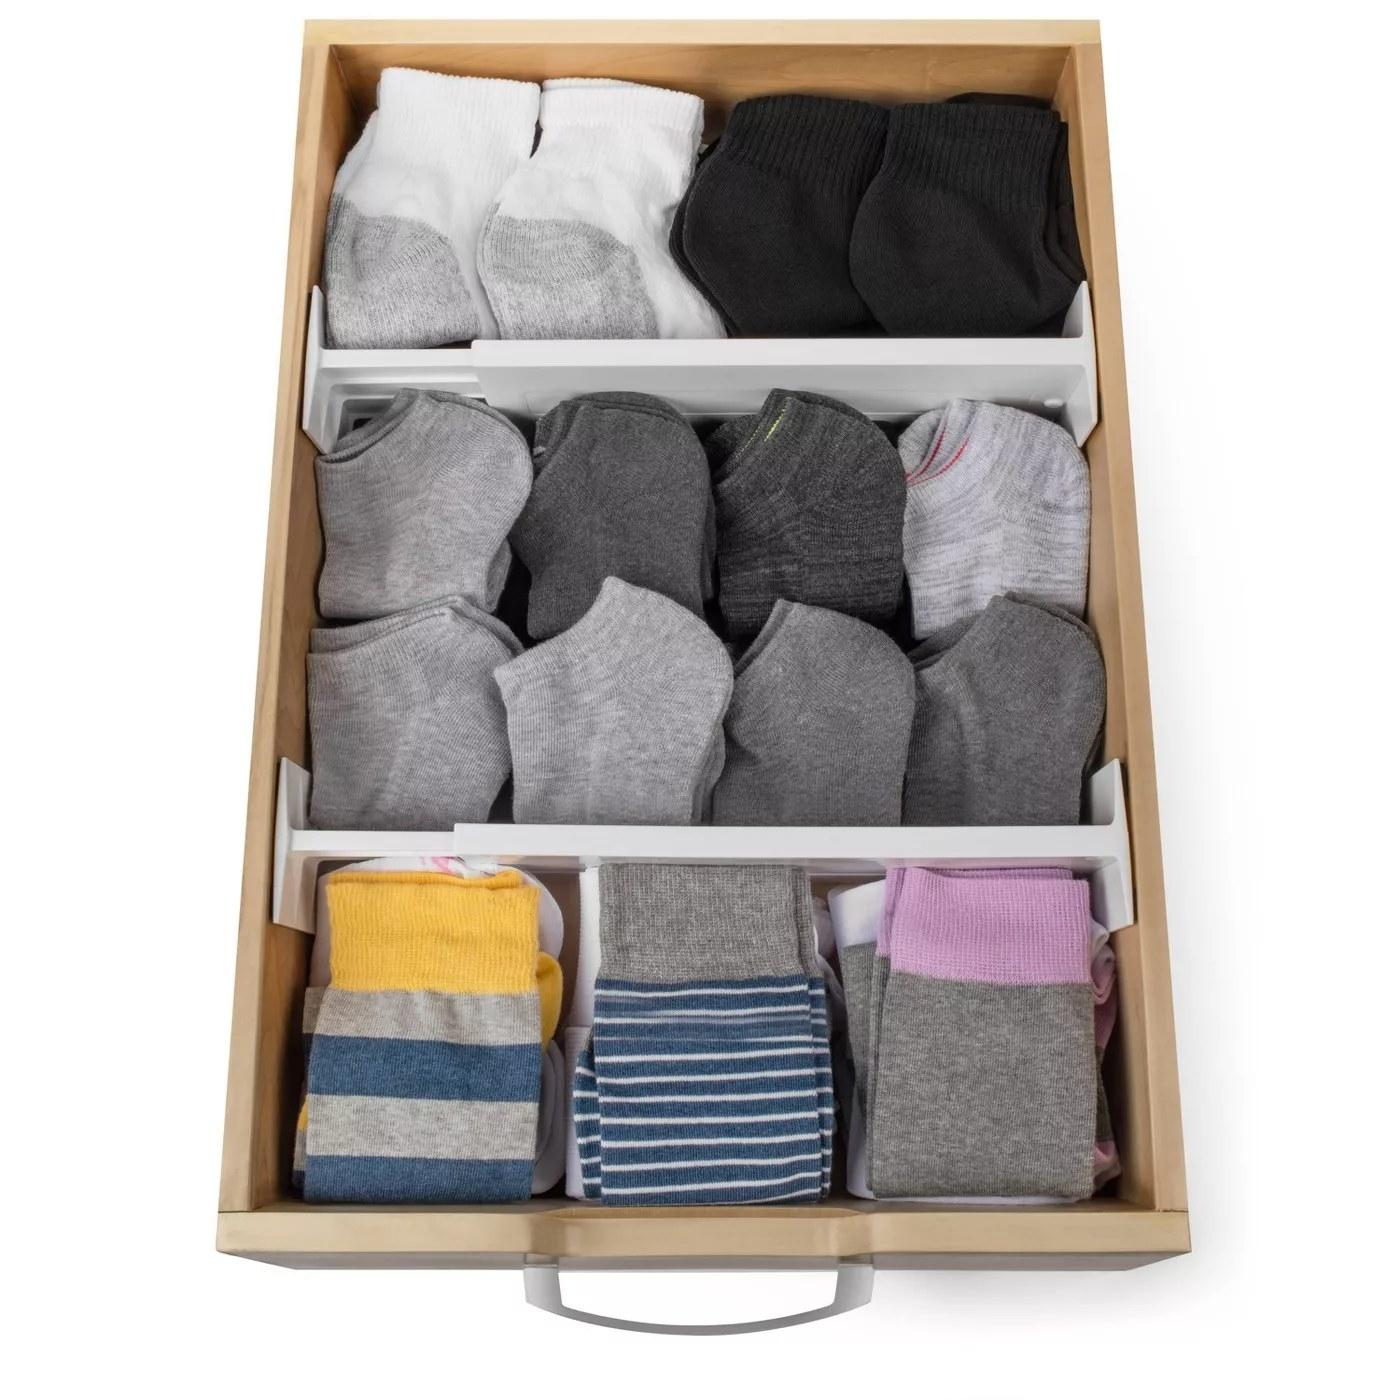 A drawer organizer